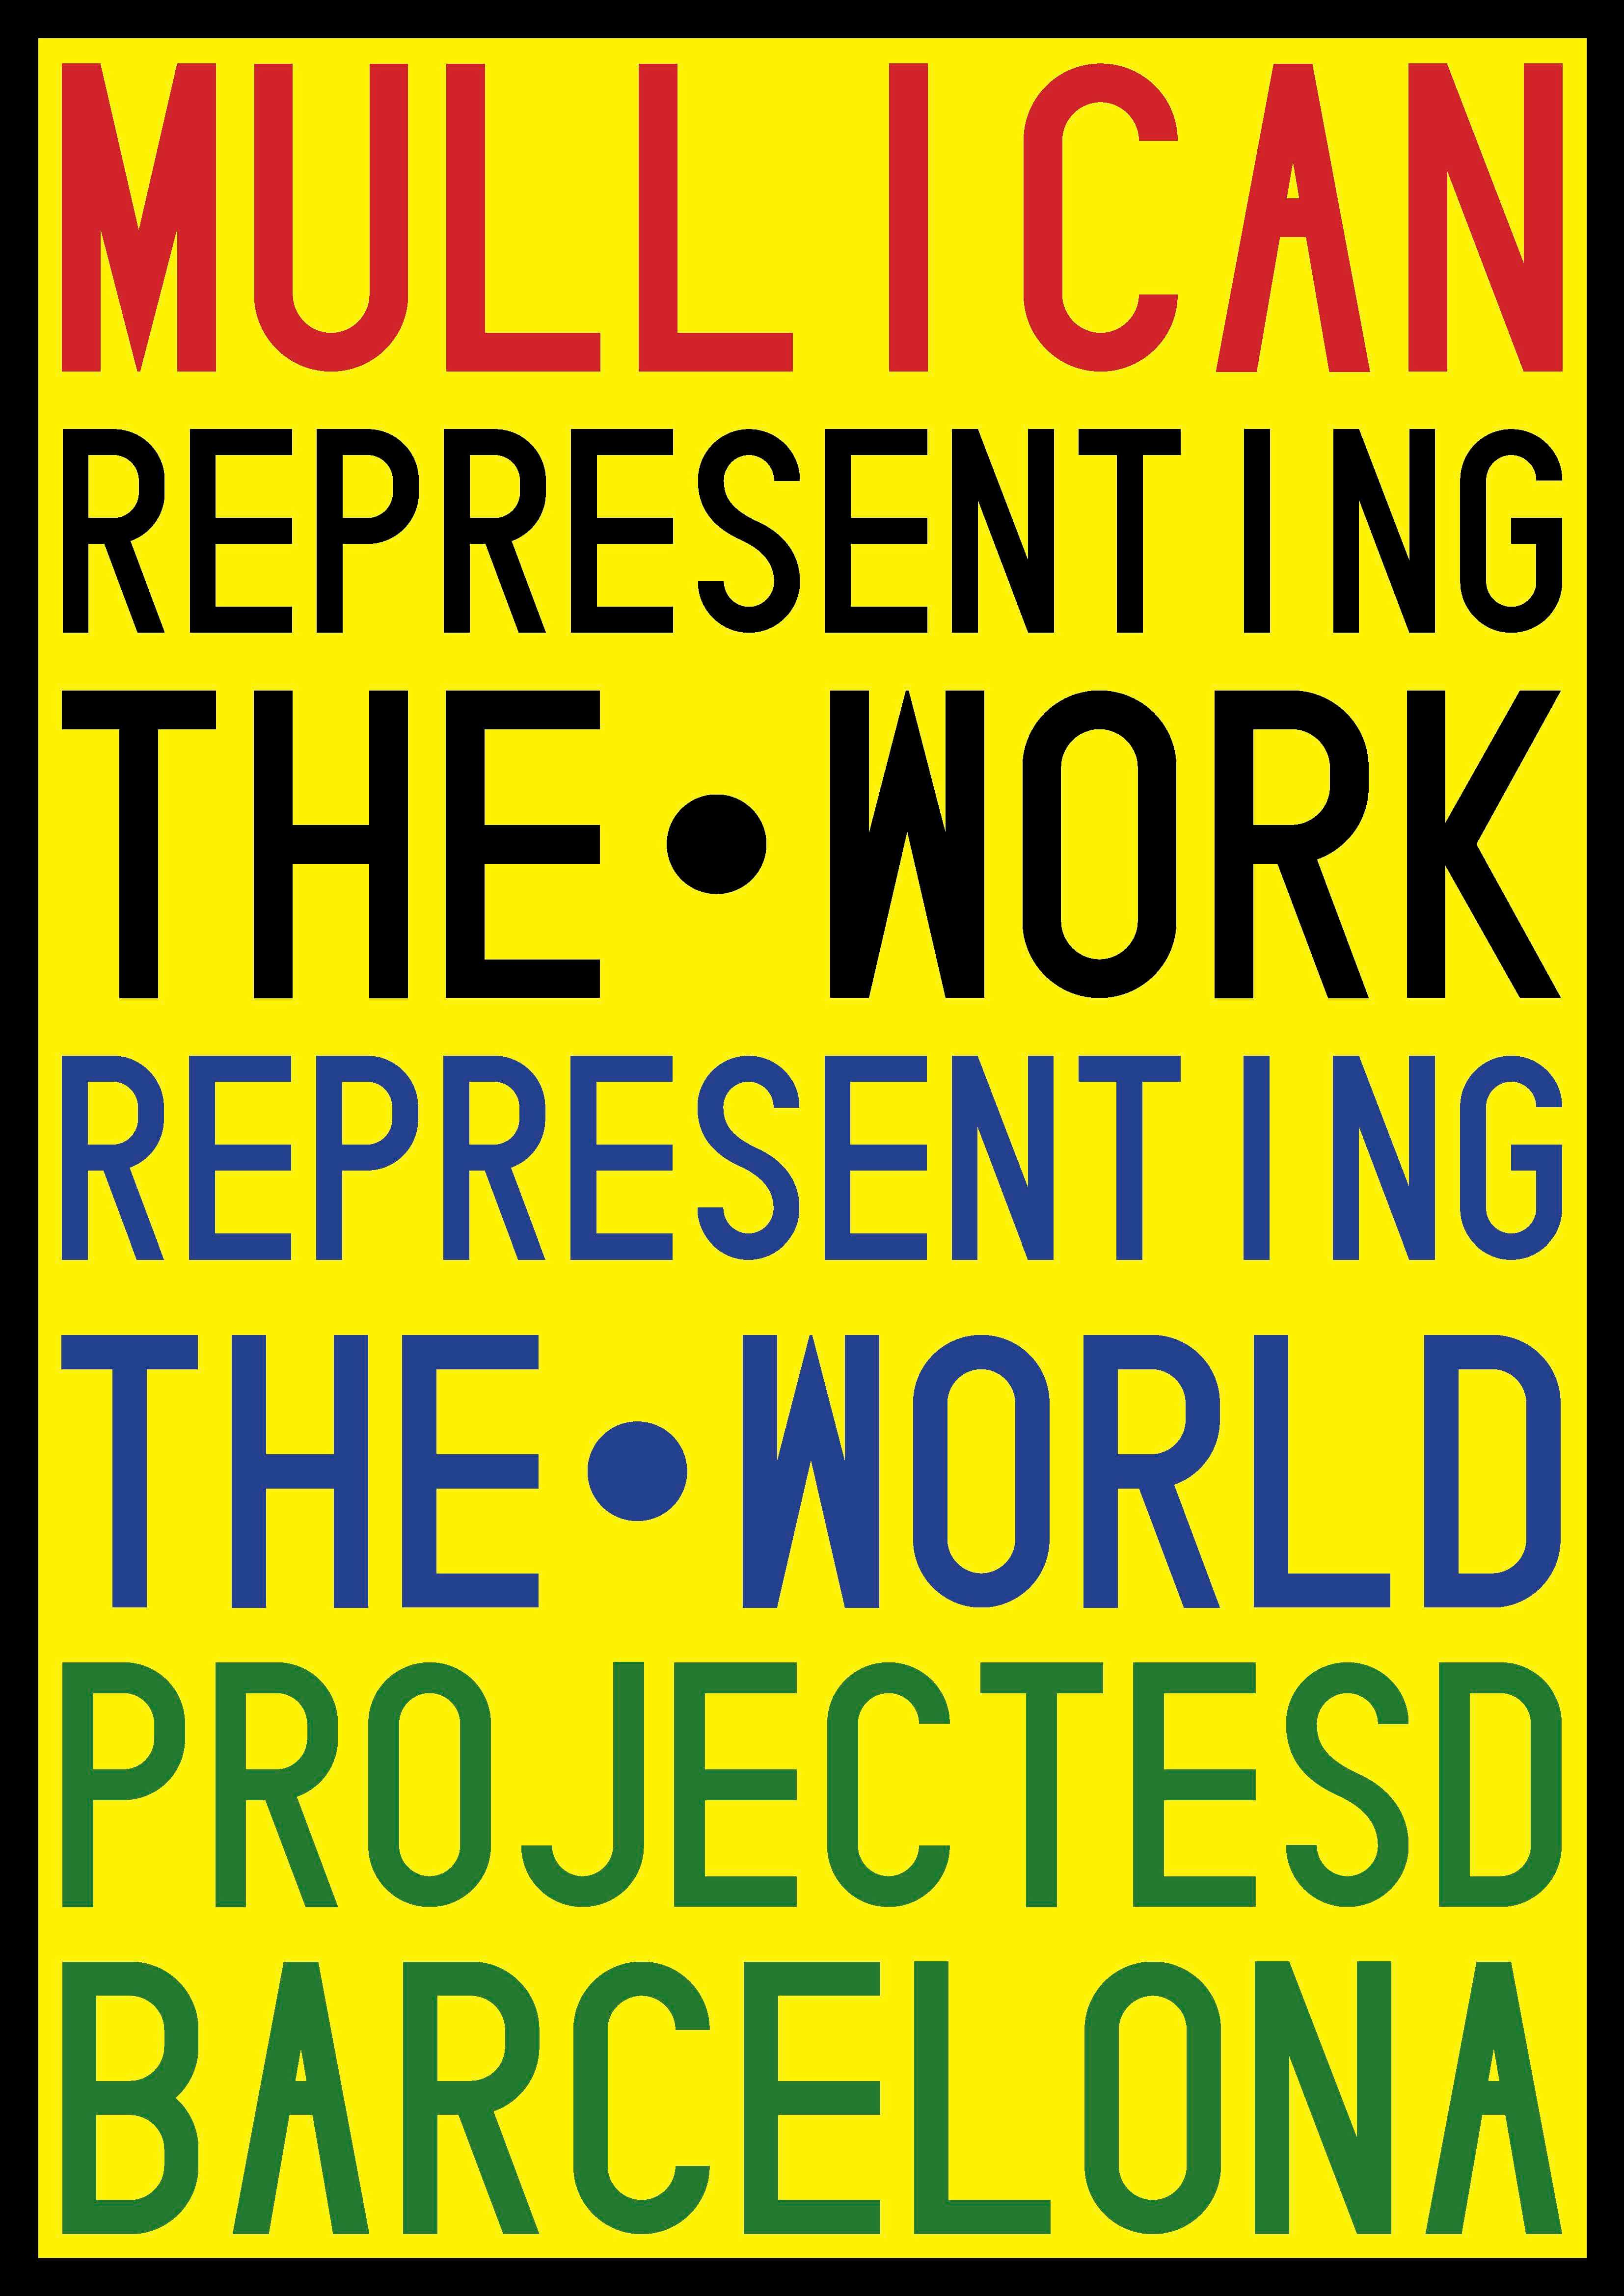 | Poster 18-PSD | ProjecteSD